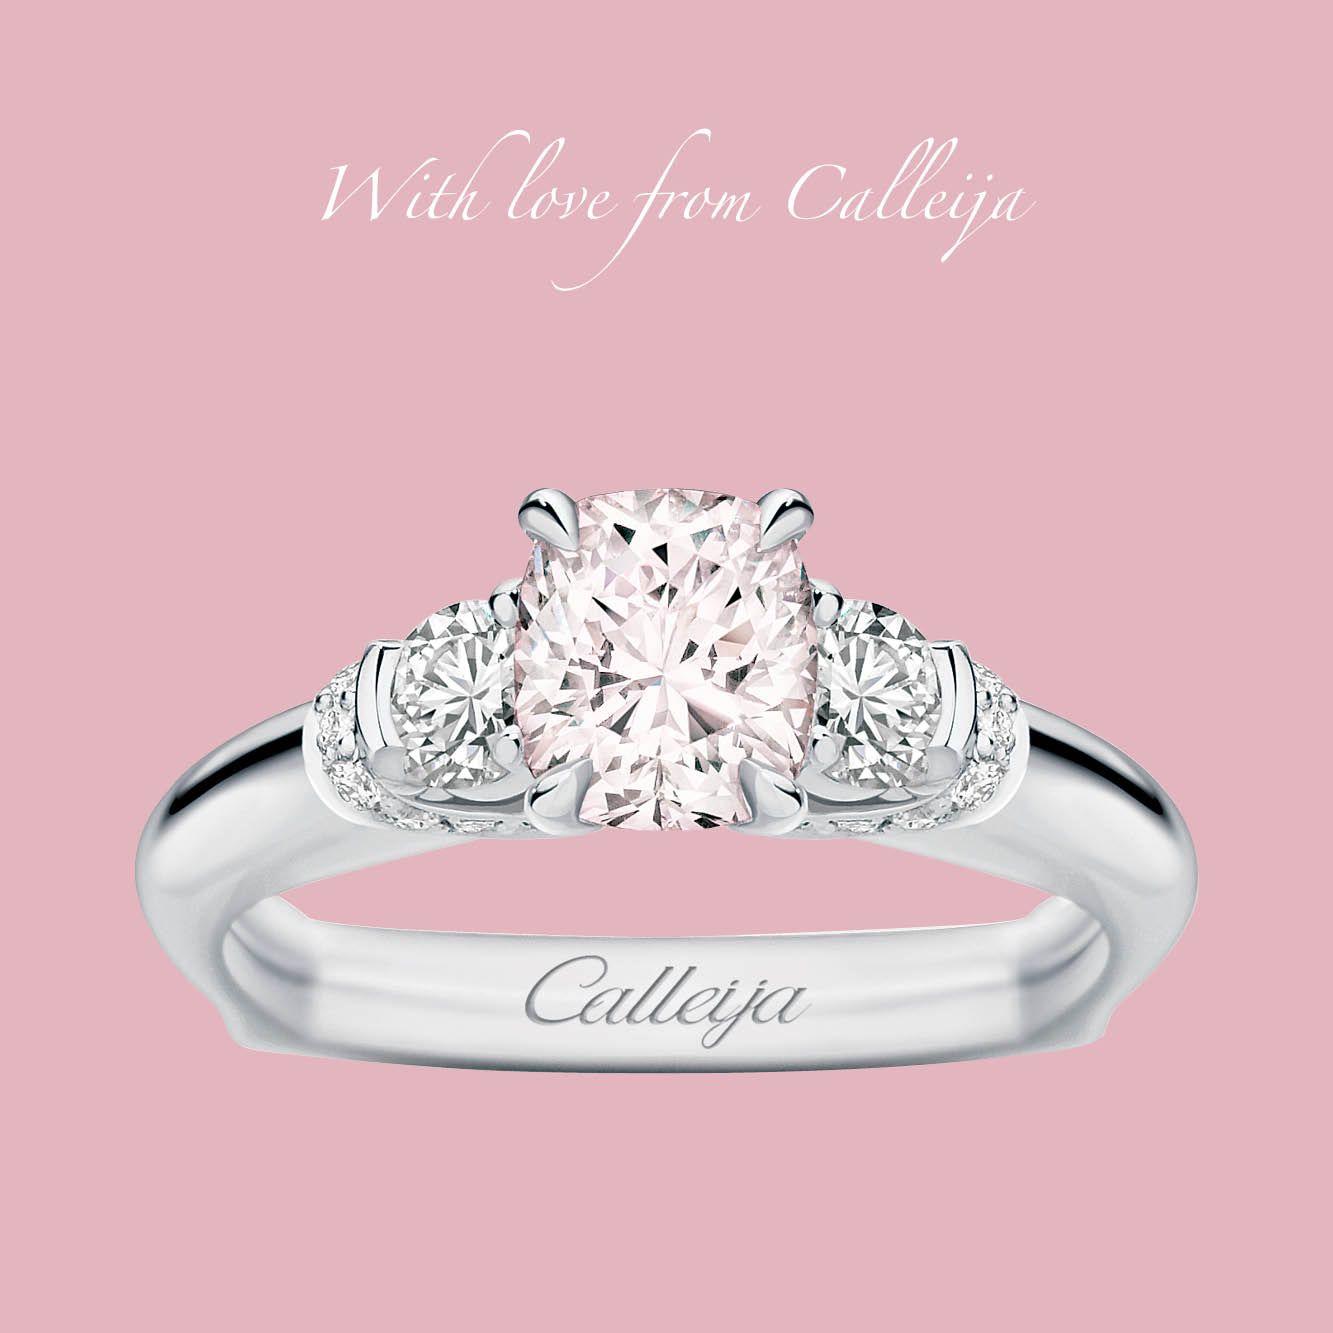 In pursuit of the most scintillating diamond, John Calleija spent ...